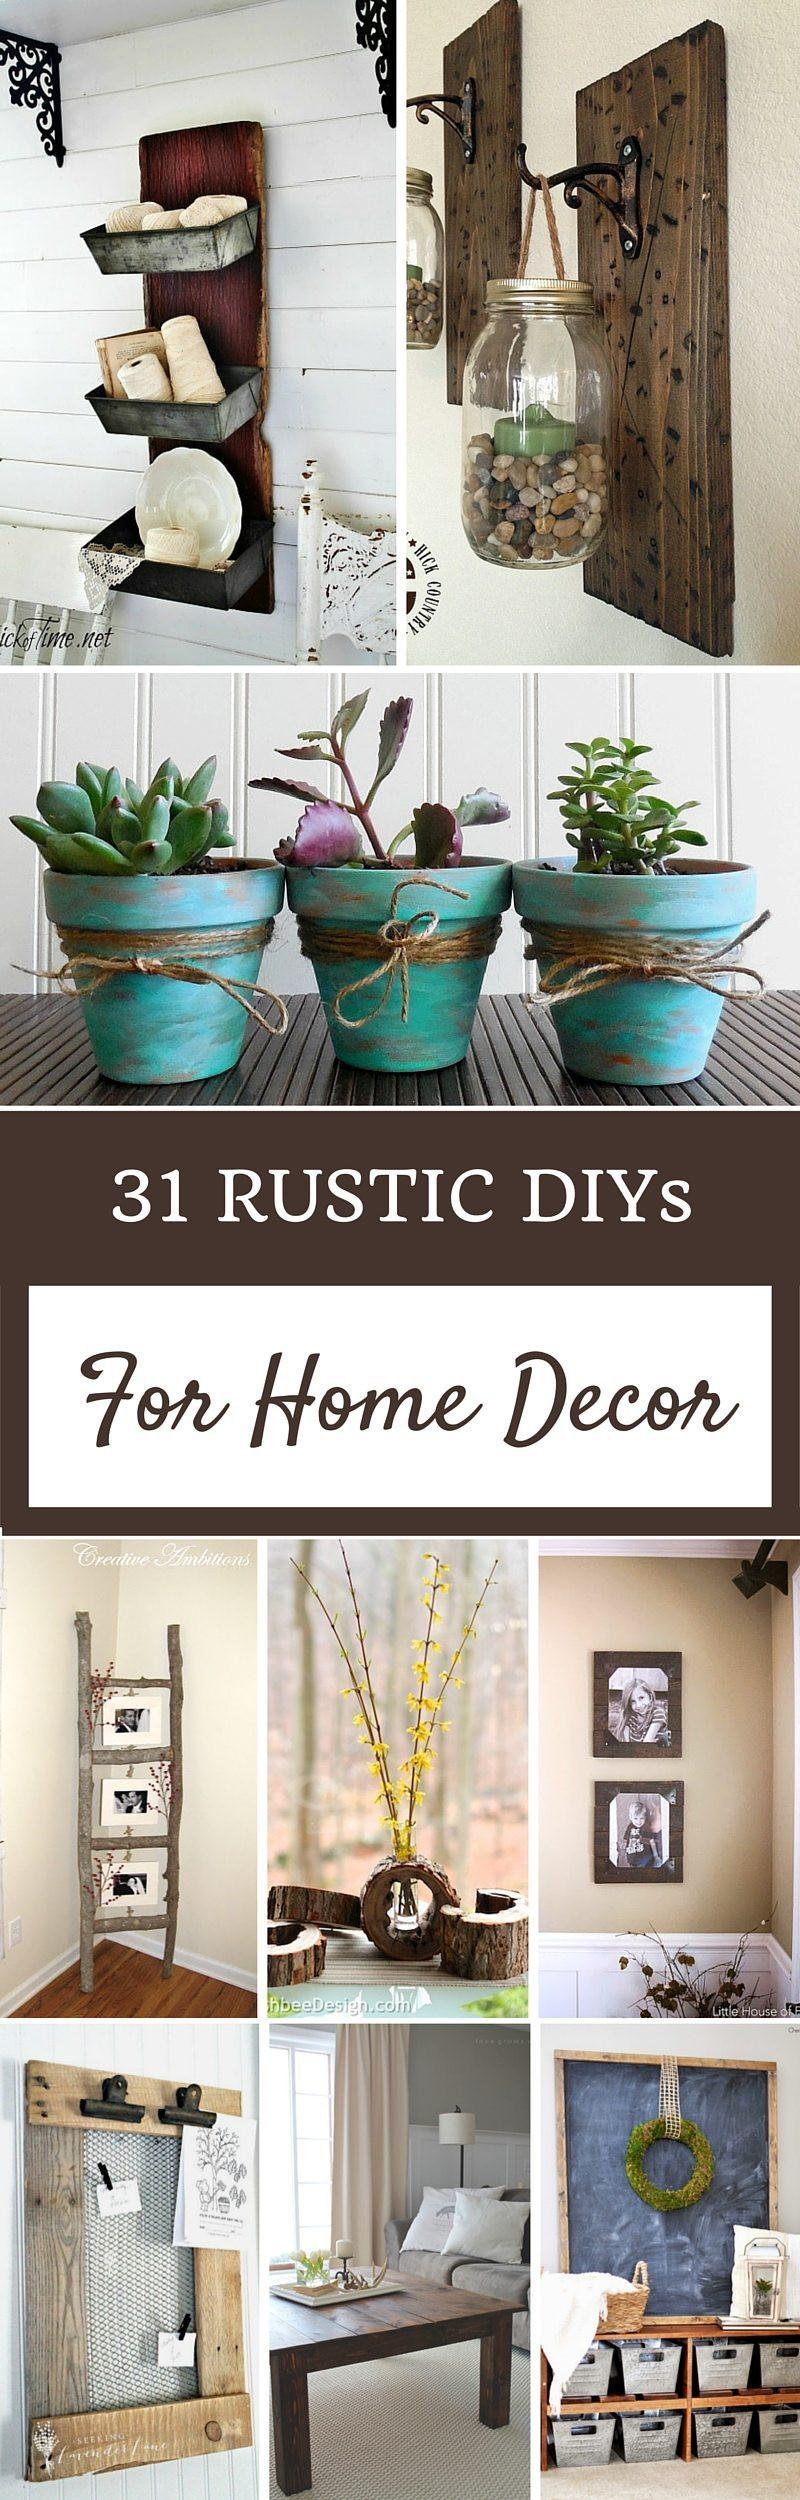 DIY Home Decorating Pinterest  Rustic Home Decor Ideas